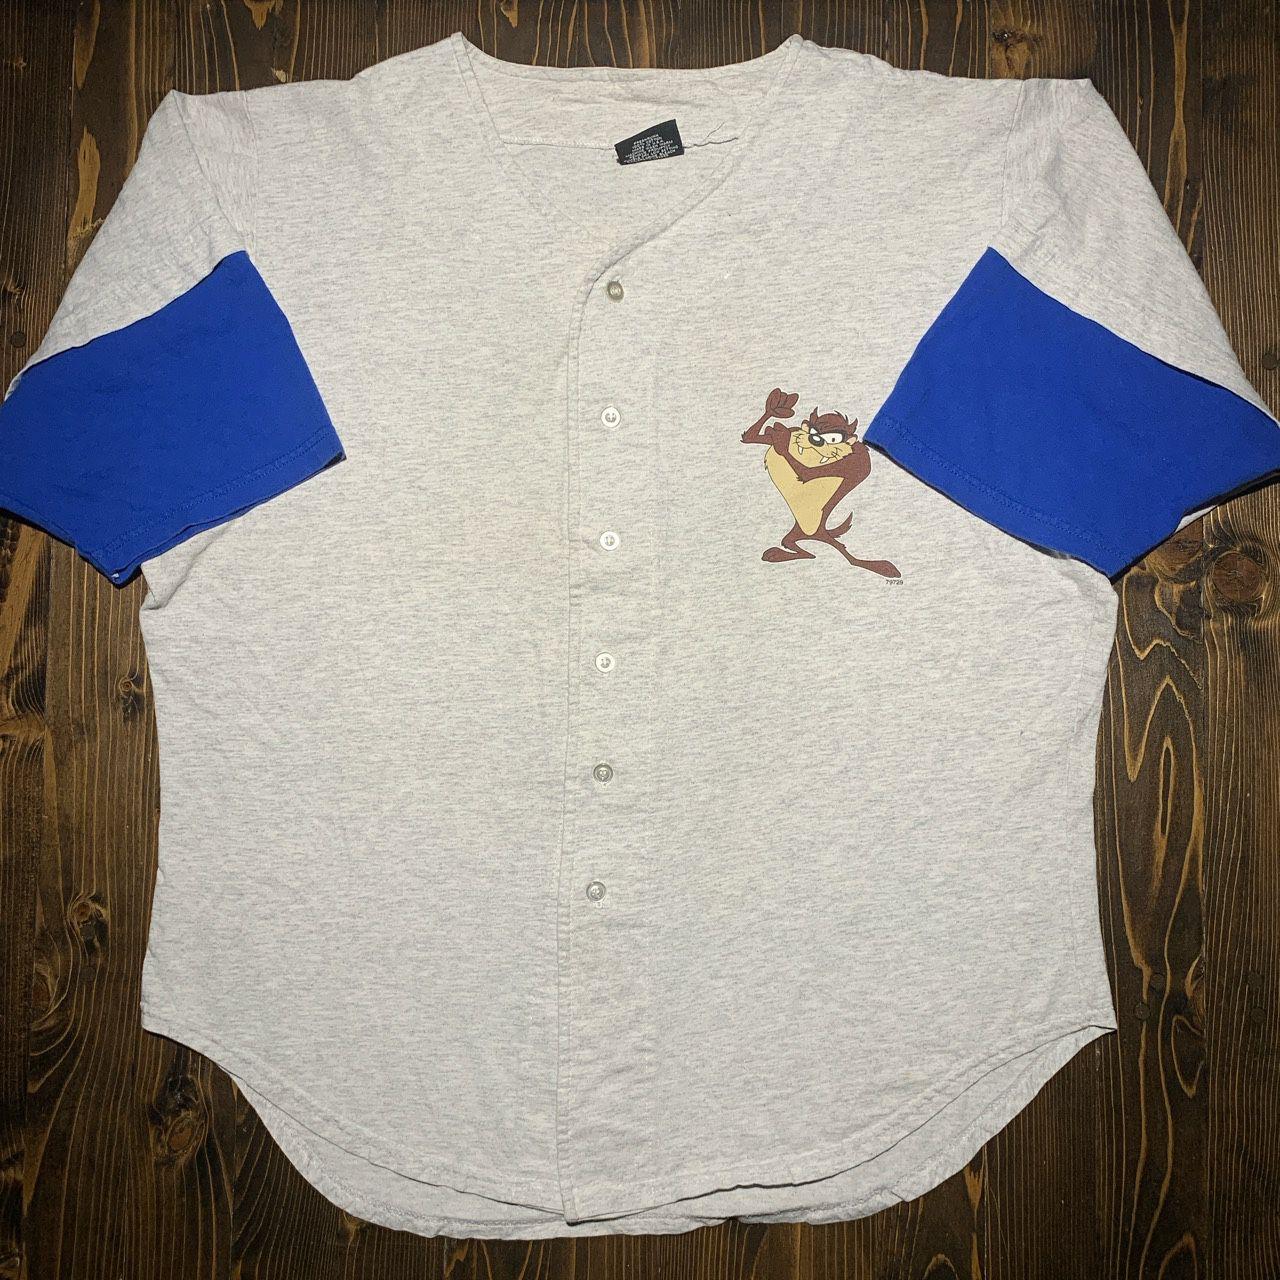 Vintage 90s Taz looney tunes baseball tee shirt